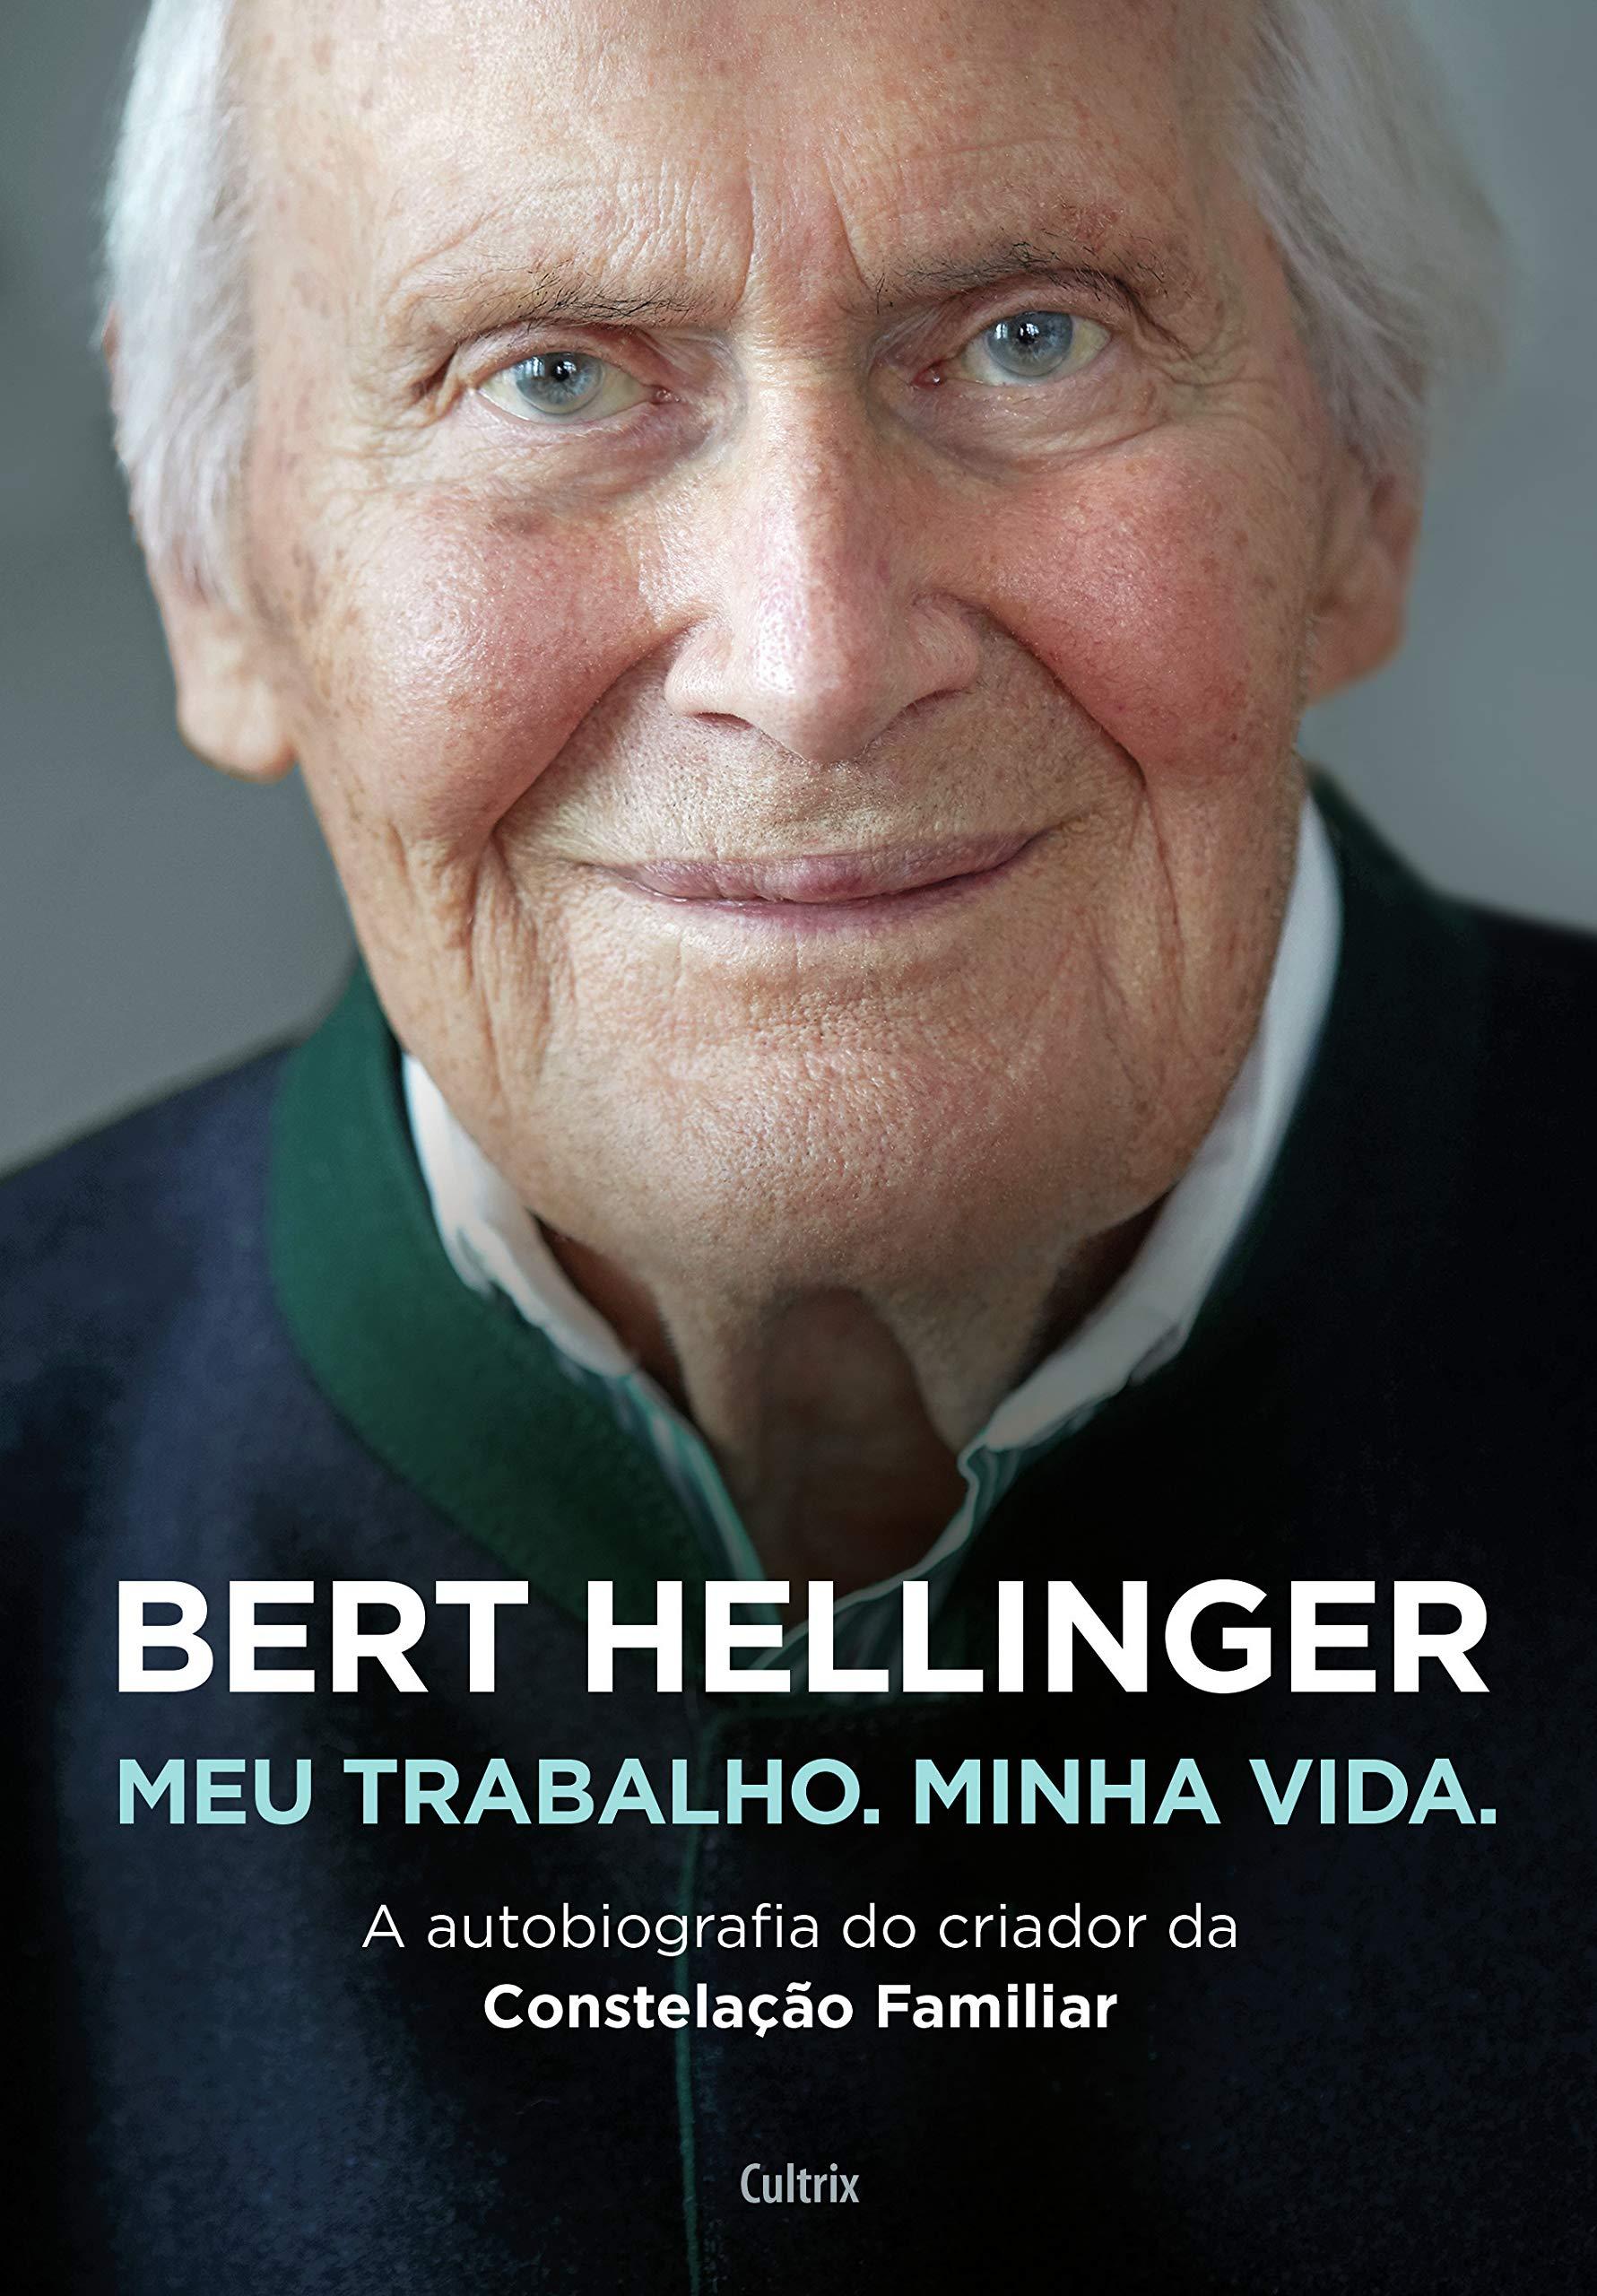 Livro 'Bert Hellinger: Meu Trabalho, Minha Vida' por  Hanne-Lore Heilmann